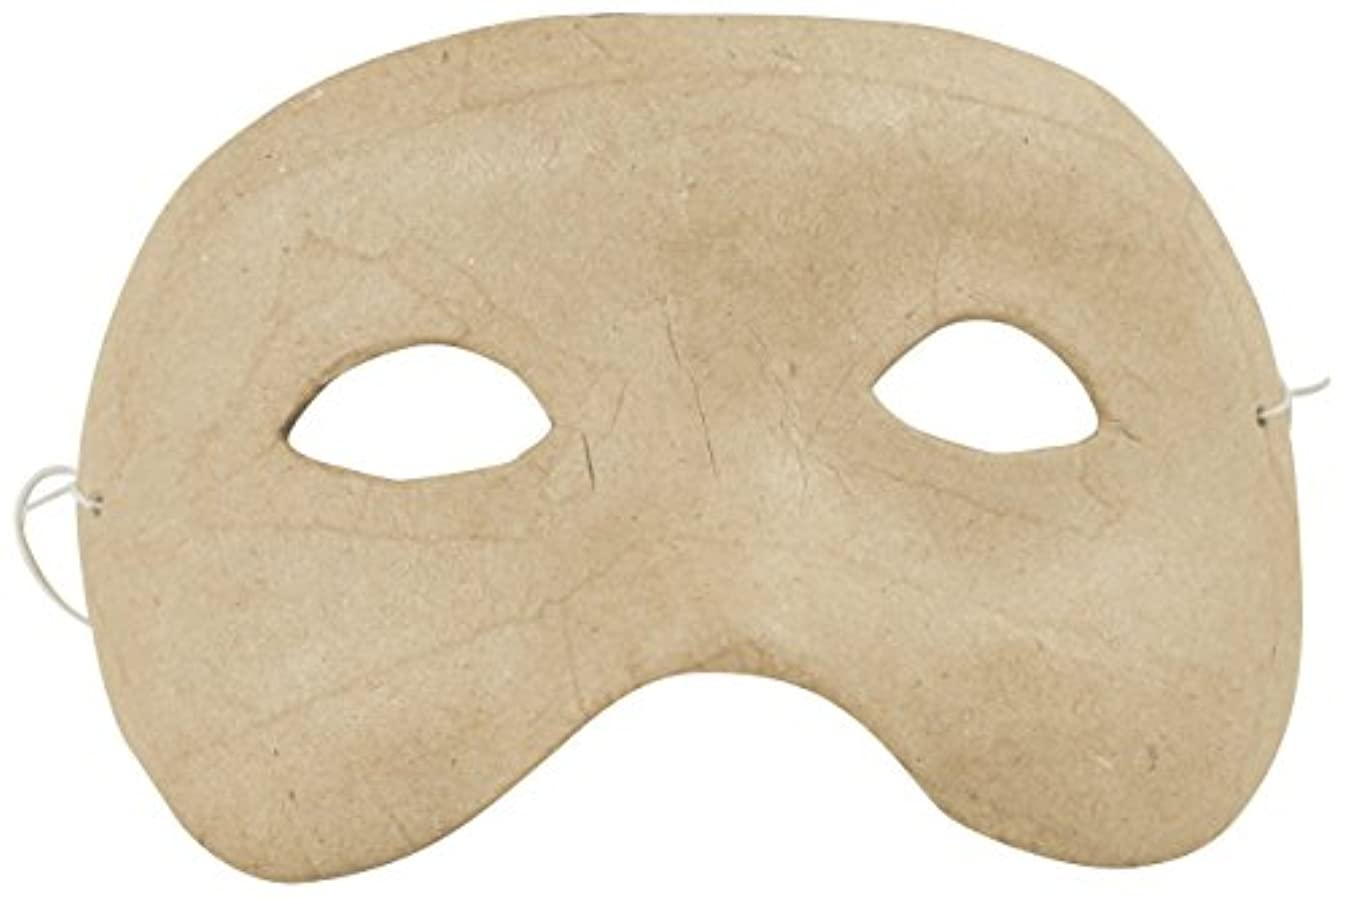 décopatch Mache Kids Eye Mask, 4 x 15 x 8.5cm, Brown